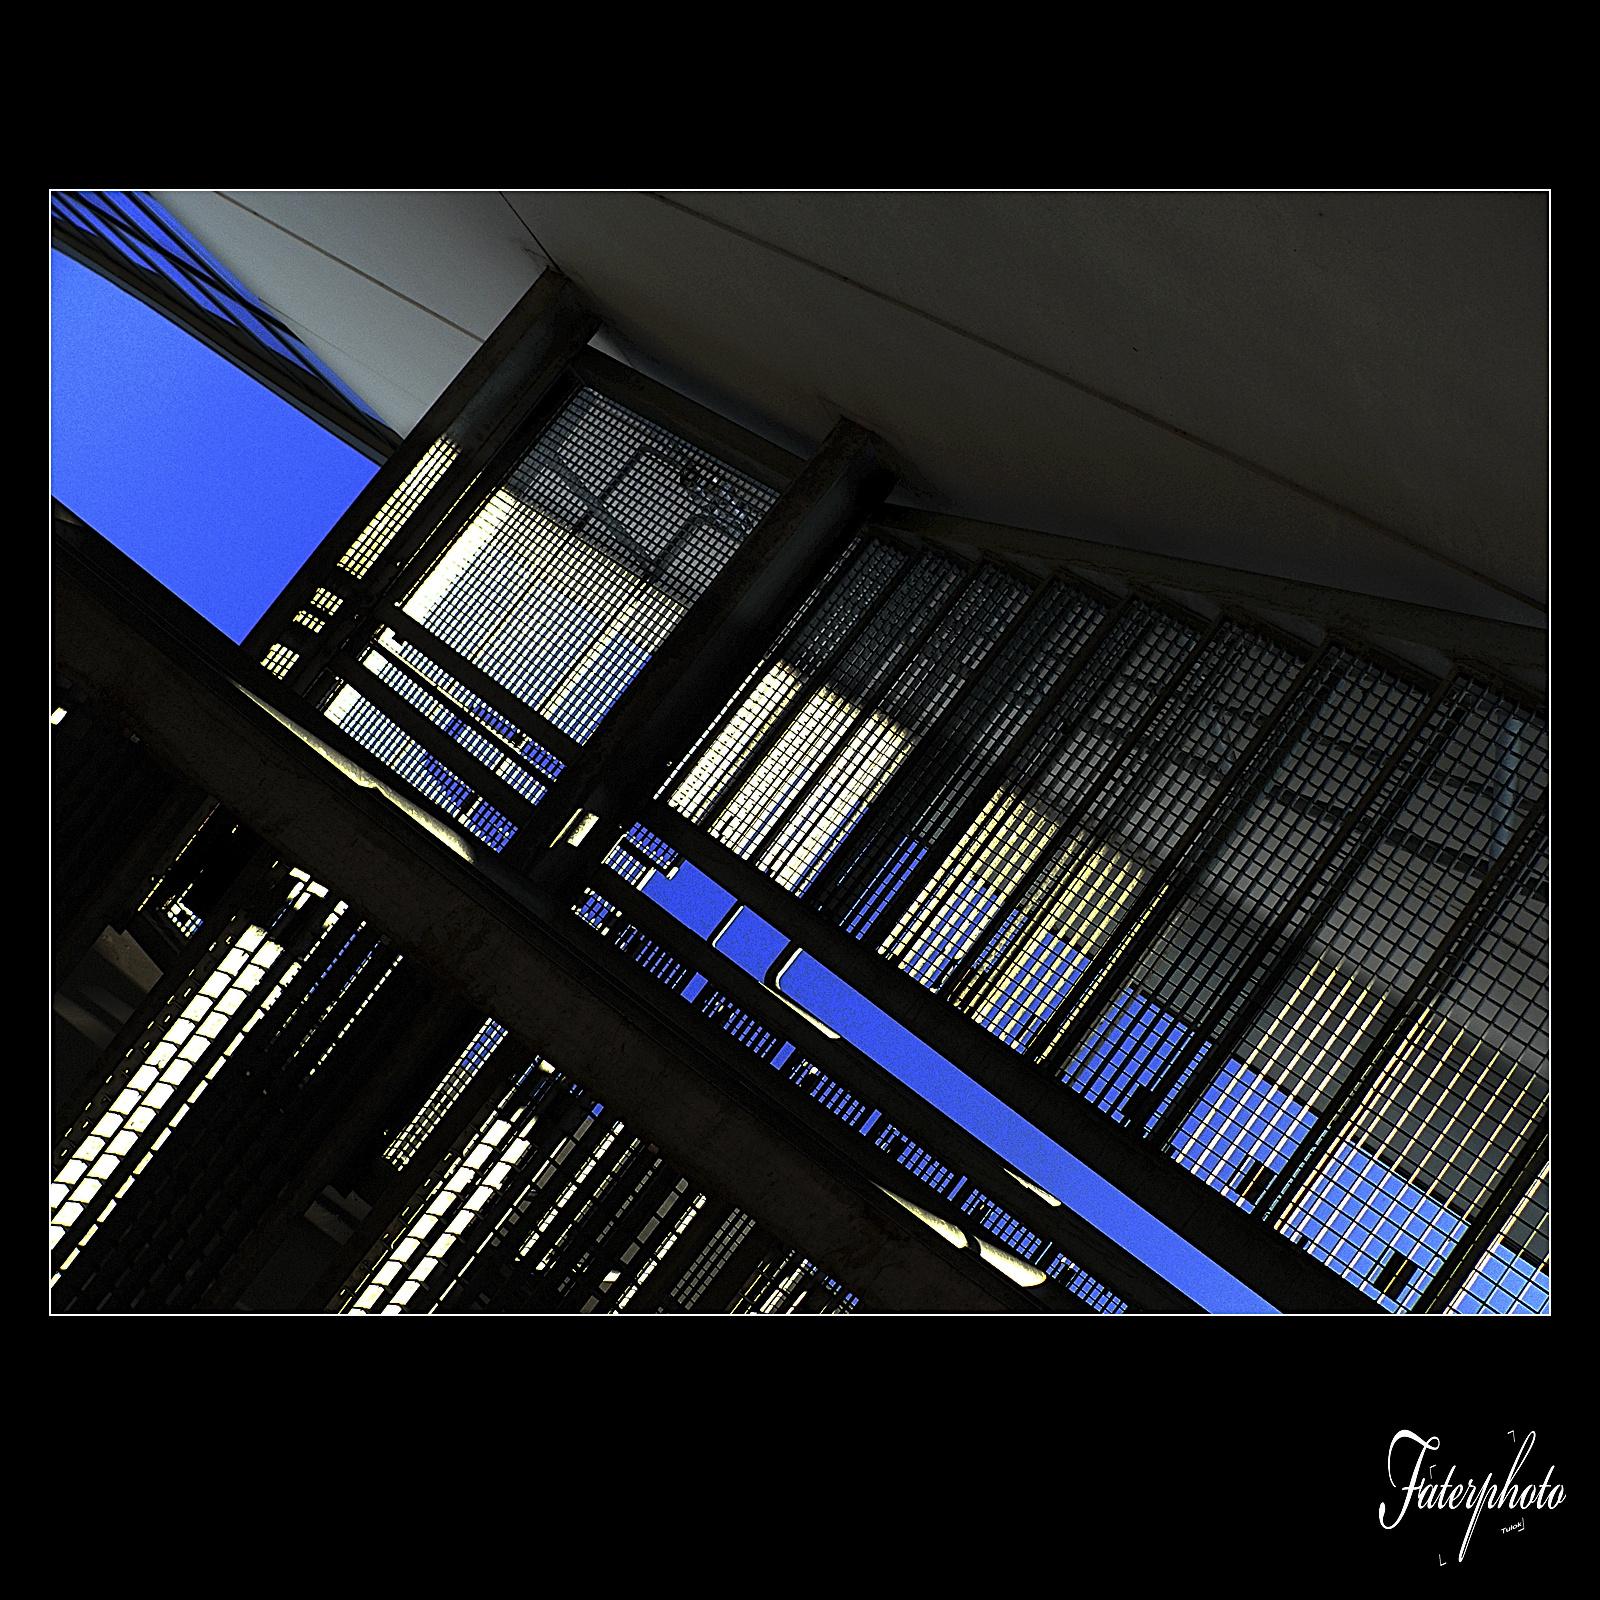 lépcső01